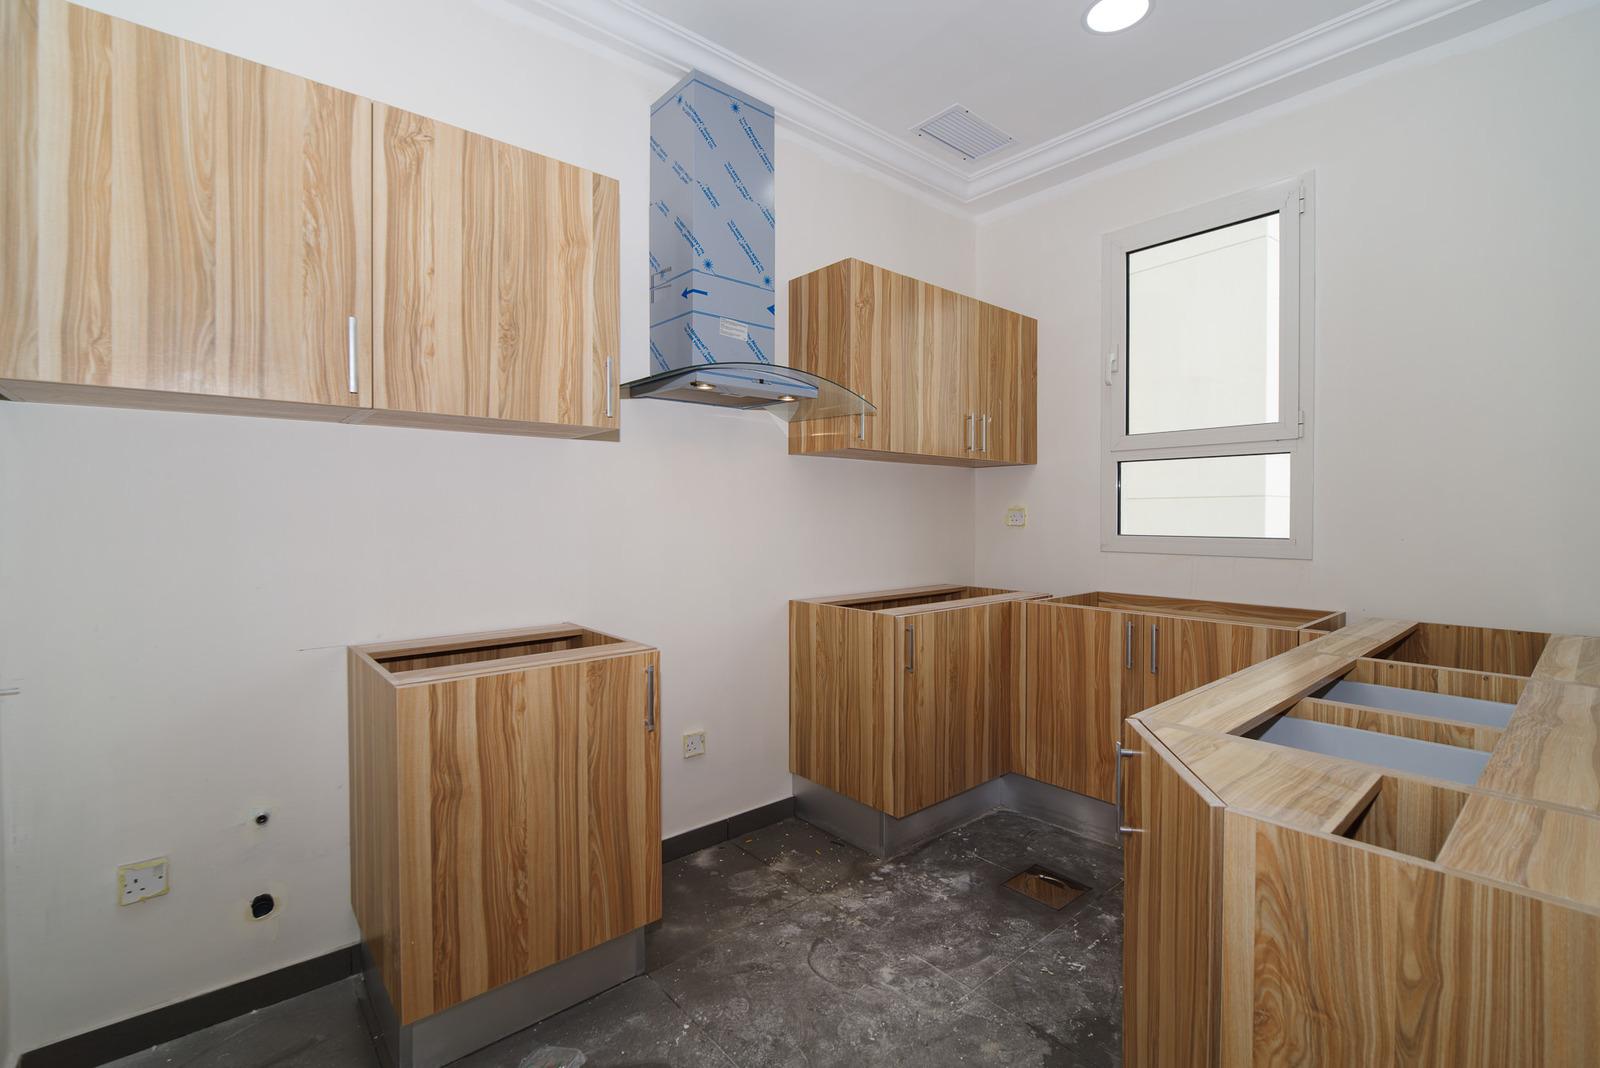 Salmiya – small, brand new, two bedroom apartments